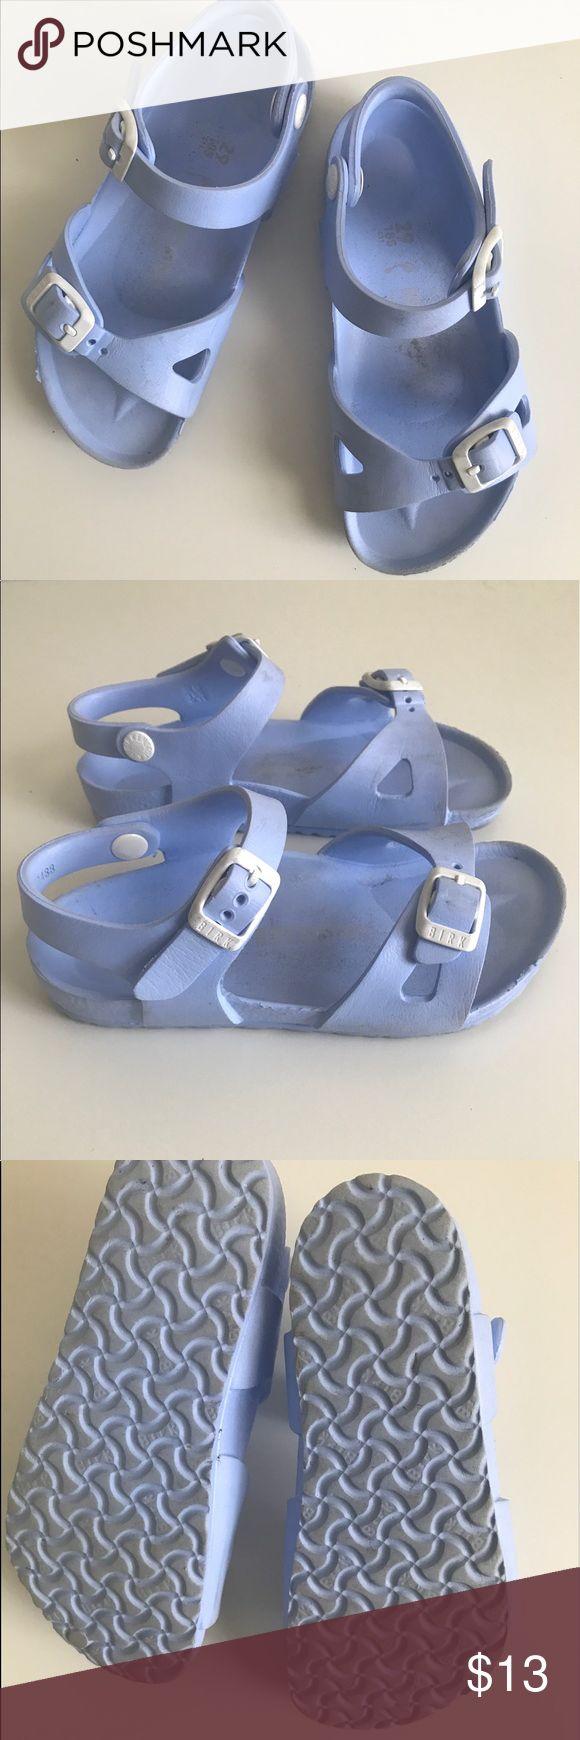 Birkenstock Rio Kids Essentials Size 11 • GUC • Water-friendly • Retail for $29.95 Birkenstock Shoes Sandals & Flip Flops